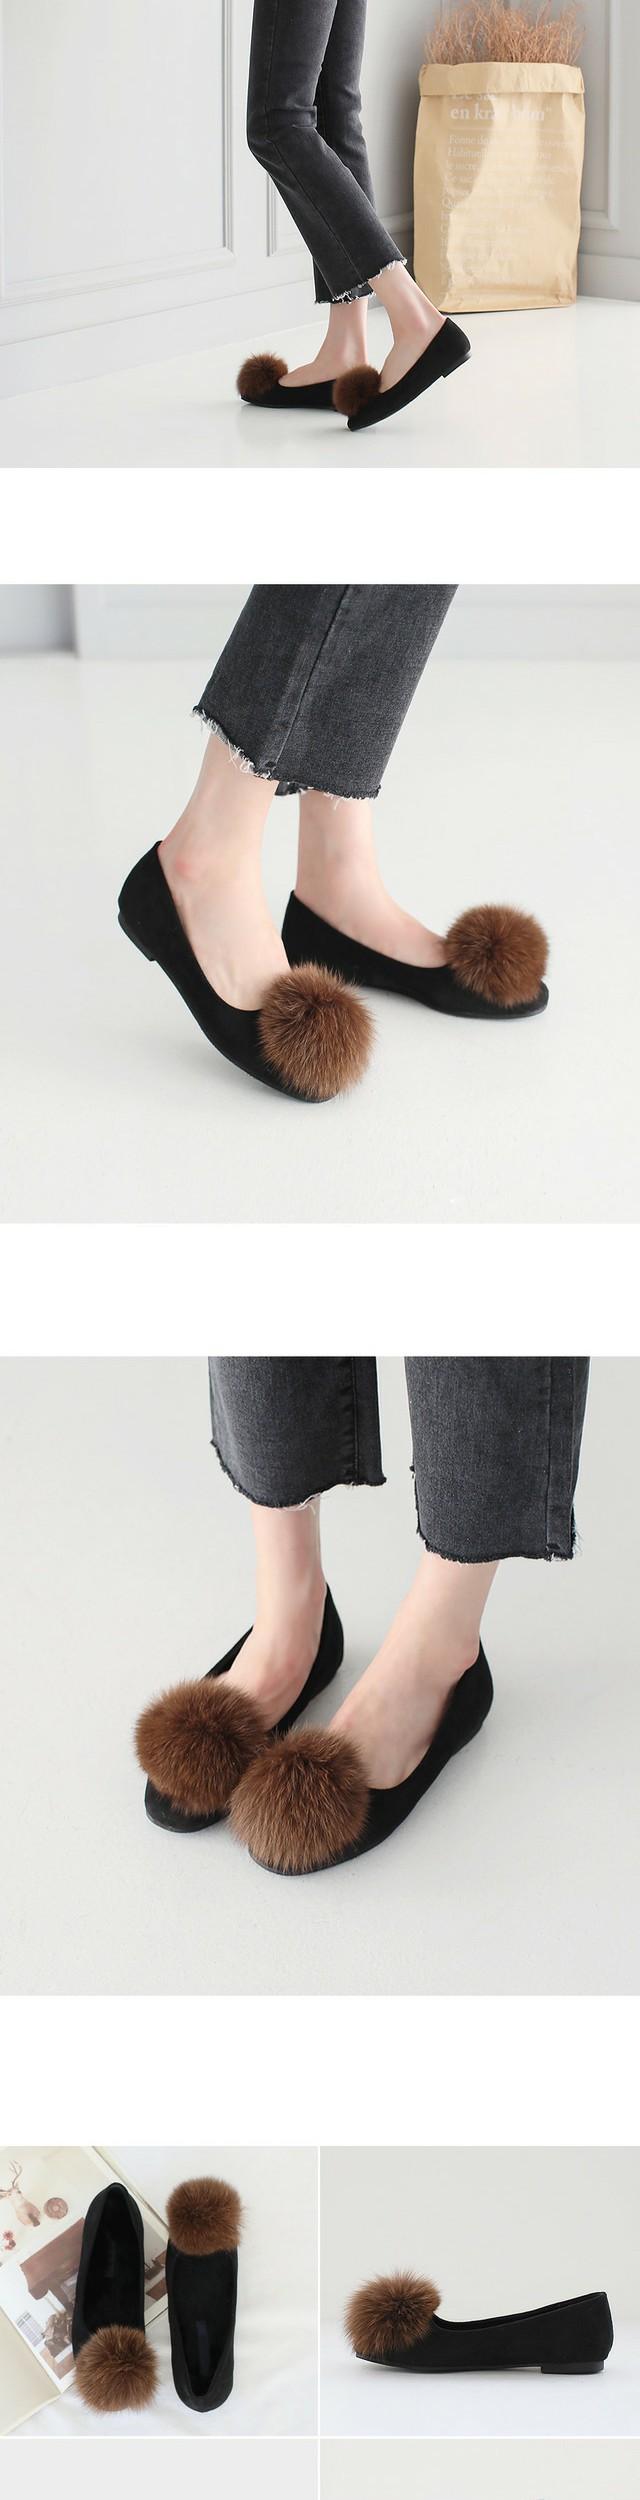 Harry Real Fur Flat Shoes 1cm